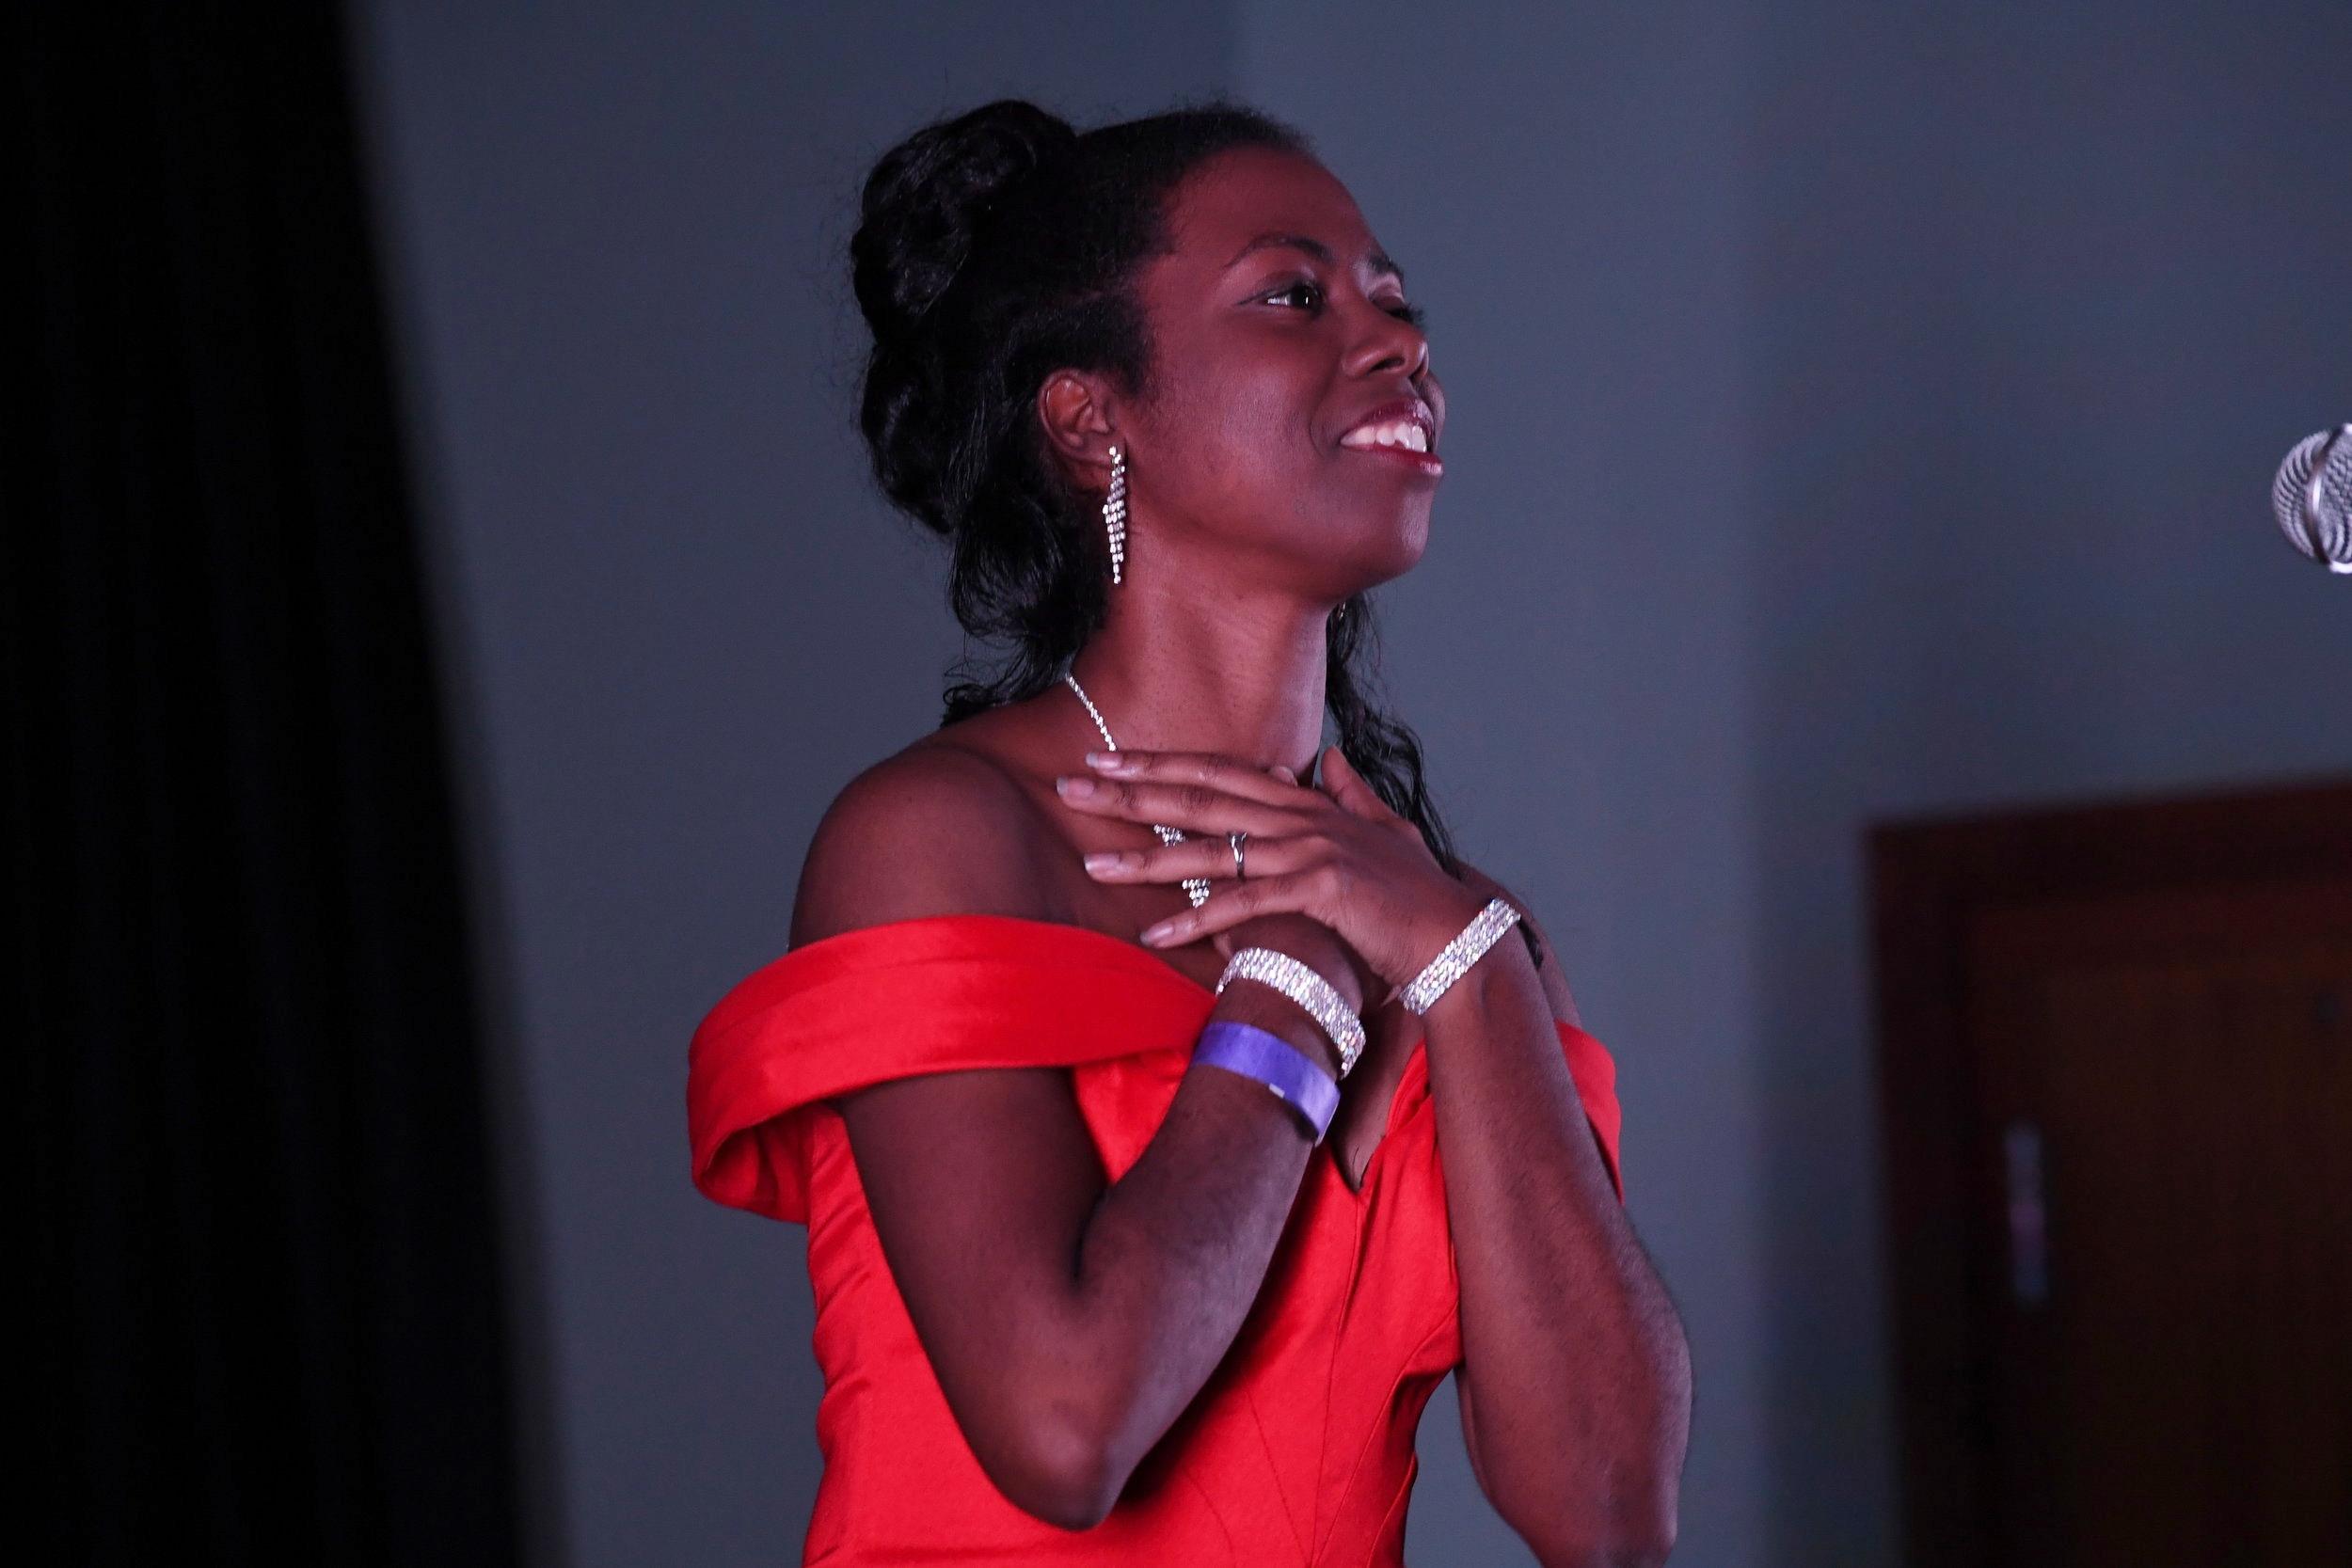 Kyaunnee Richardson. DDeRosa photo.